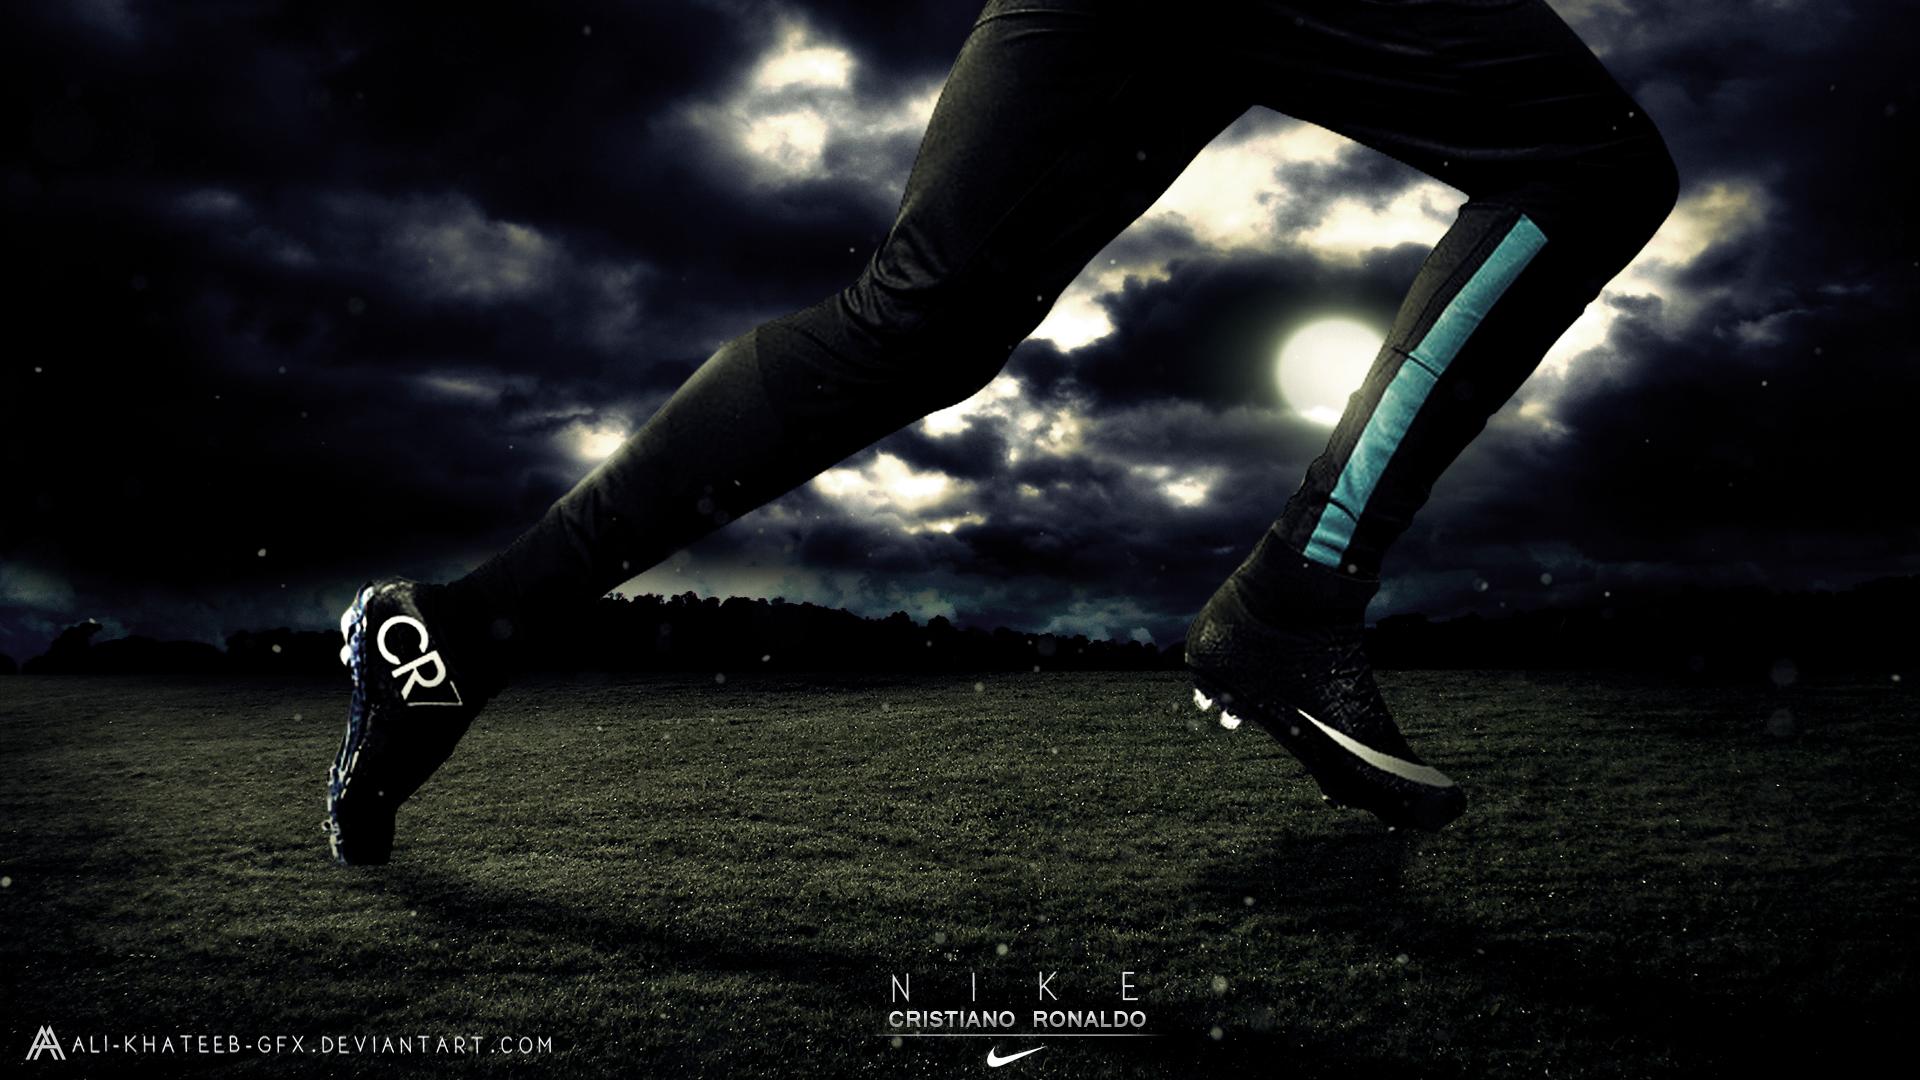 Download Cristiano Ronaldo Nike Hd Wallpaper By Ali Khateeb Gfx